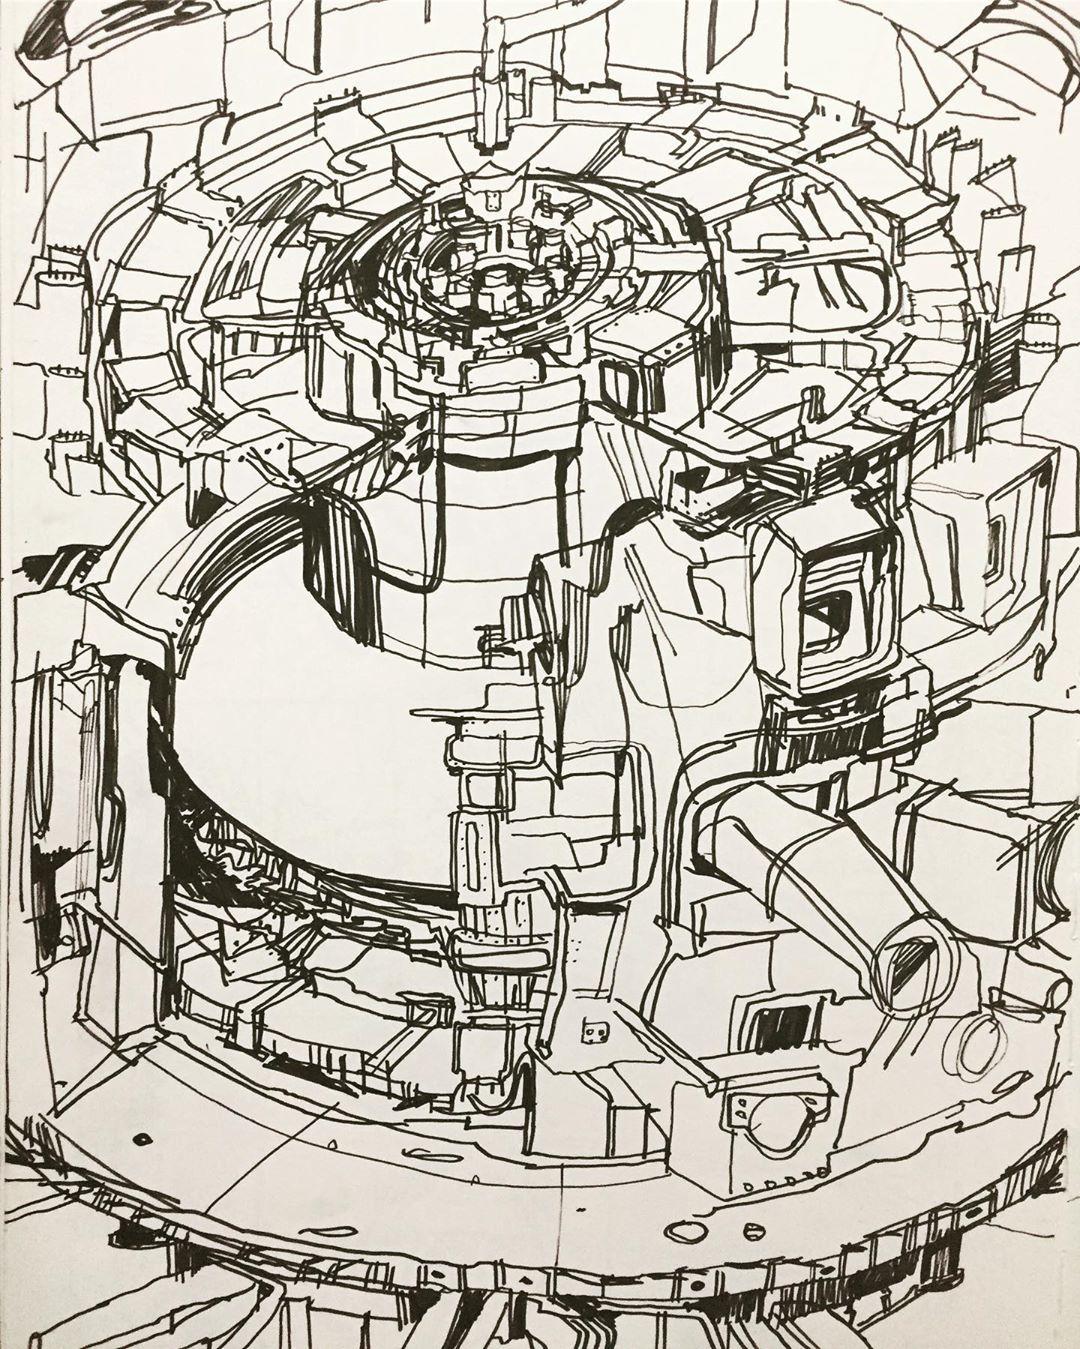 """Fusion Reactor"", Marker, 12"" x 18"""